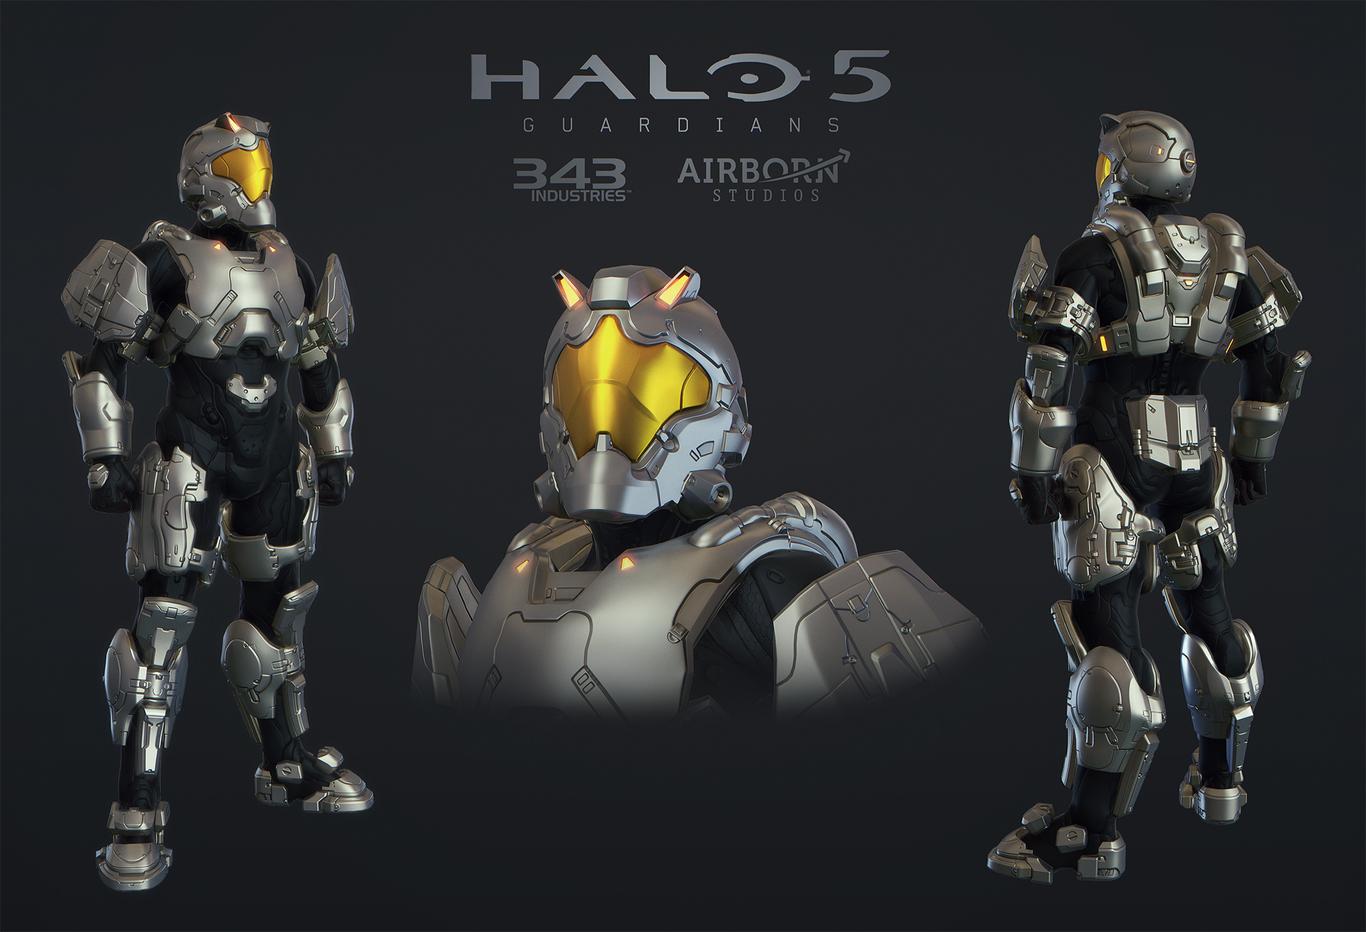 Halo 5 Multiplayer Suit Maveric by AirbornStudios | Sci-Fi | 3D